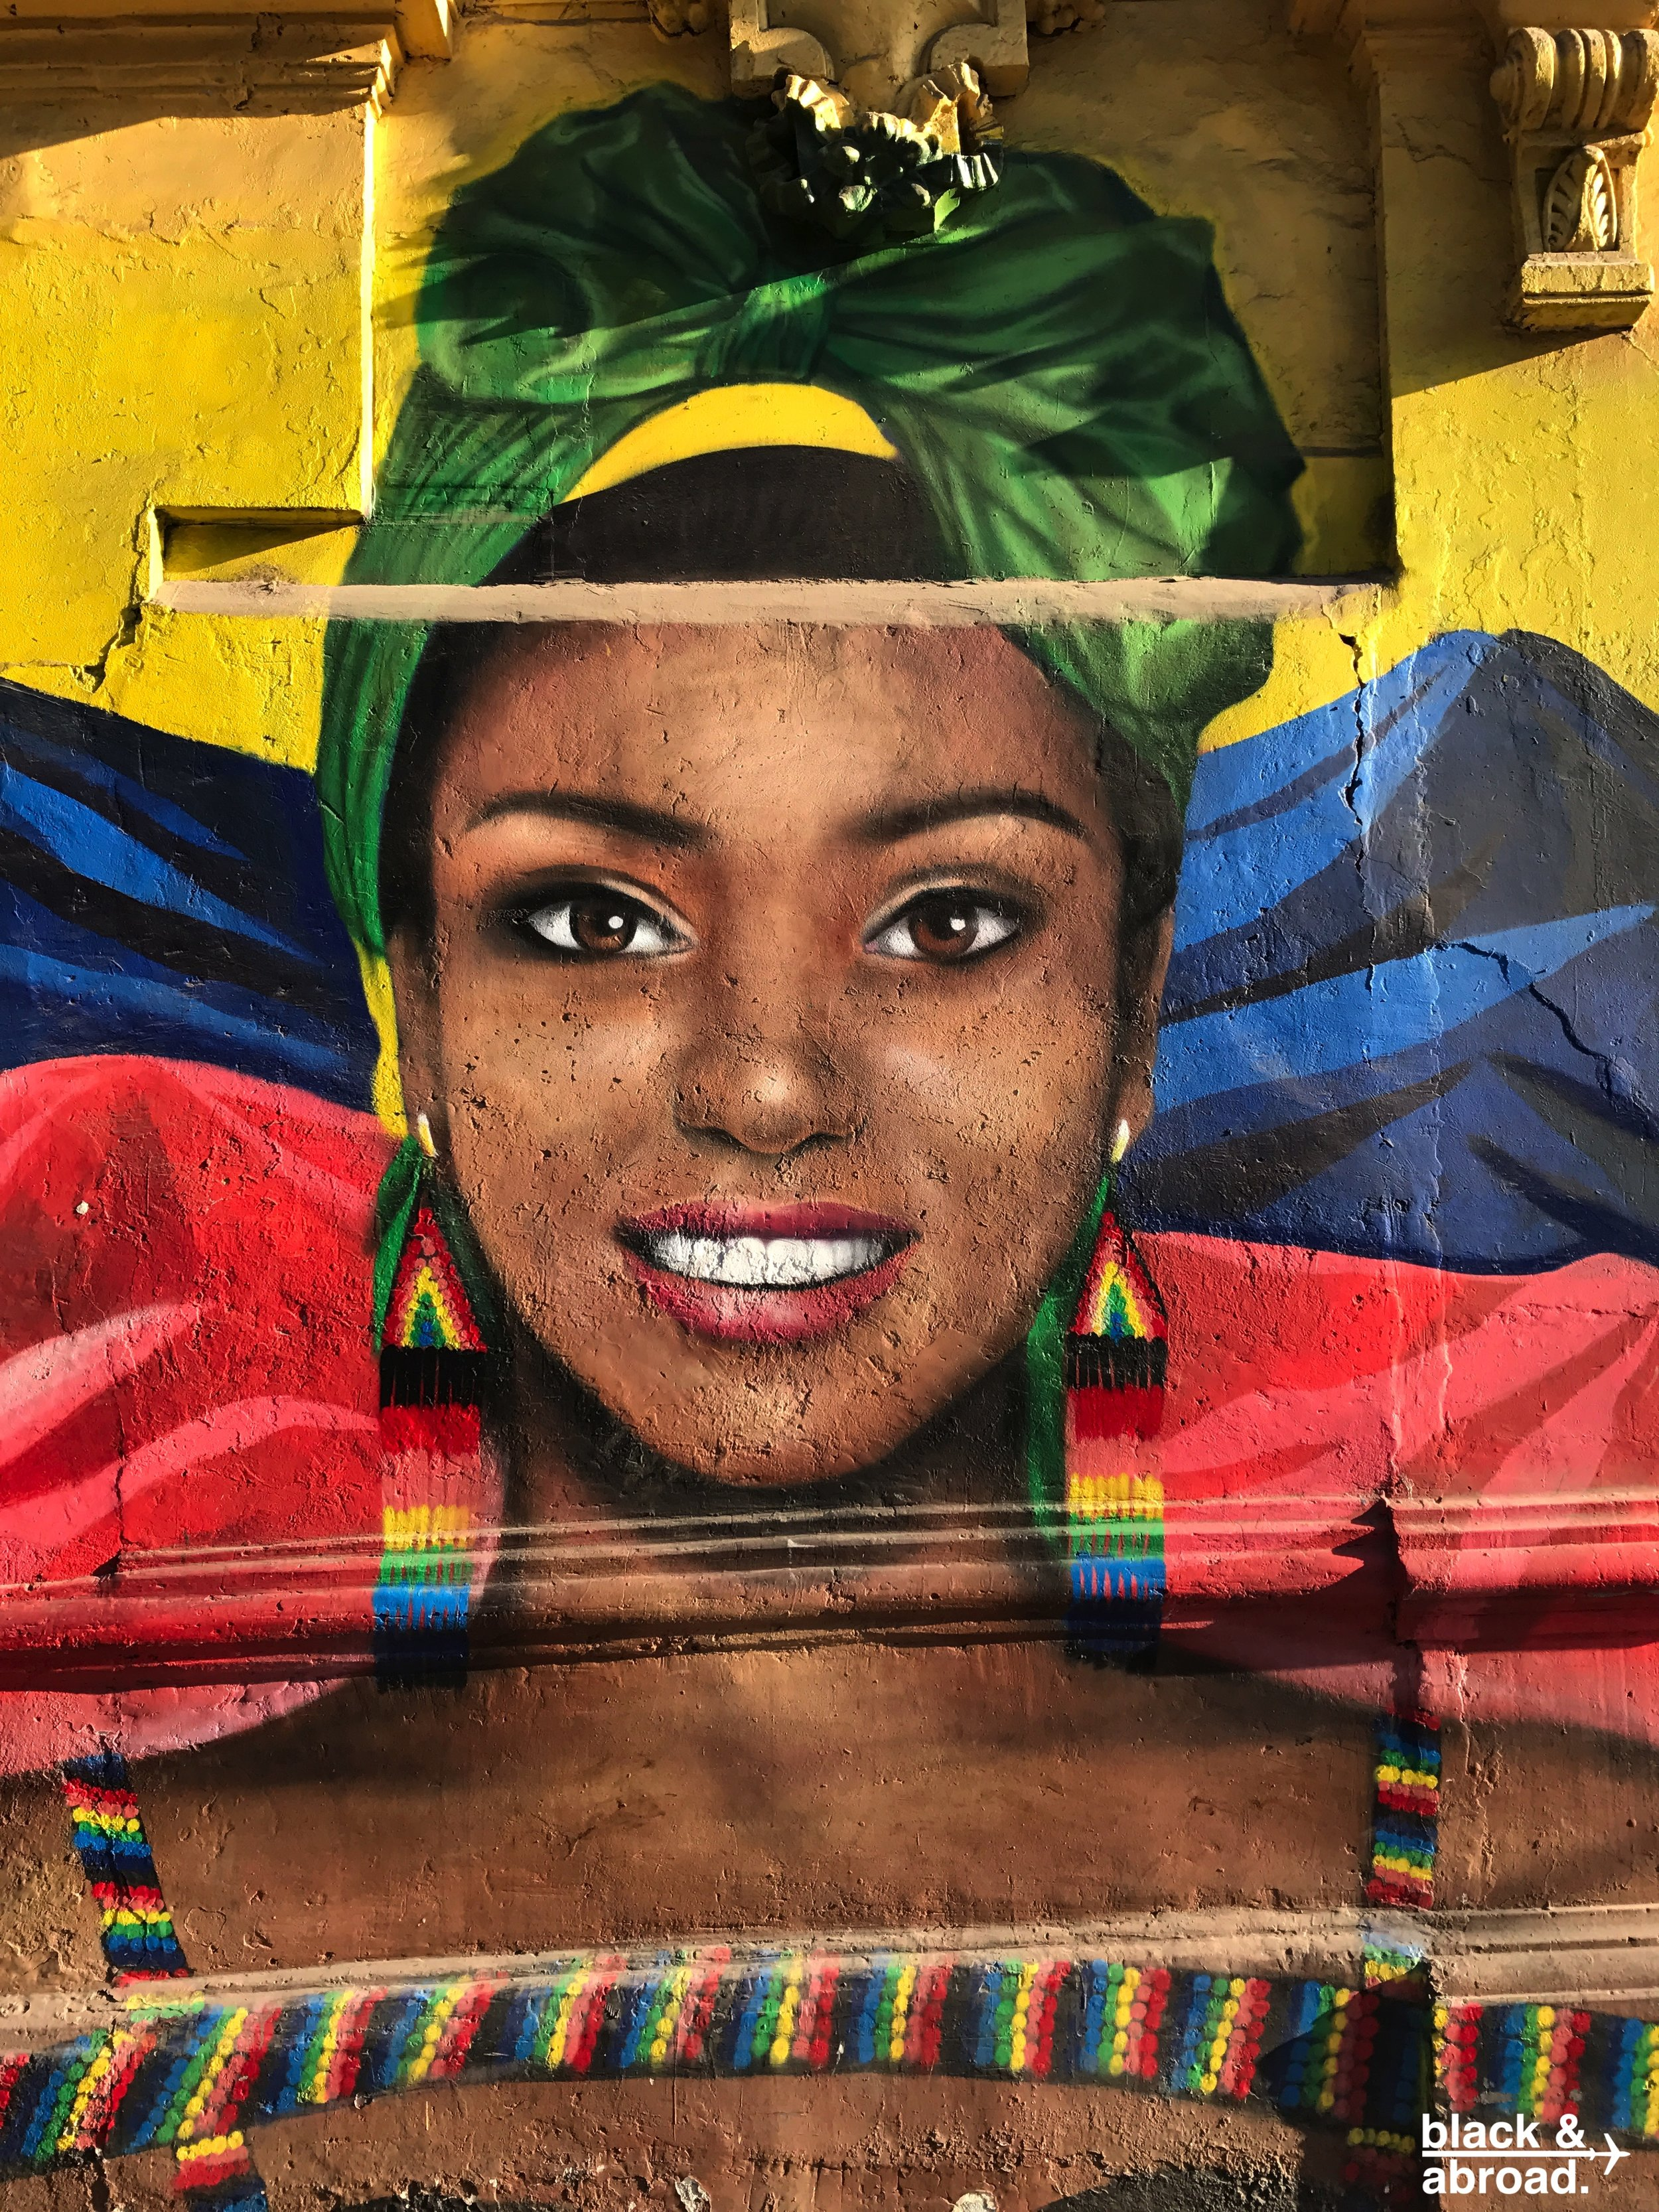 Some of the fantastic street art in Barrio Bellavista!